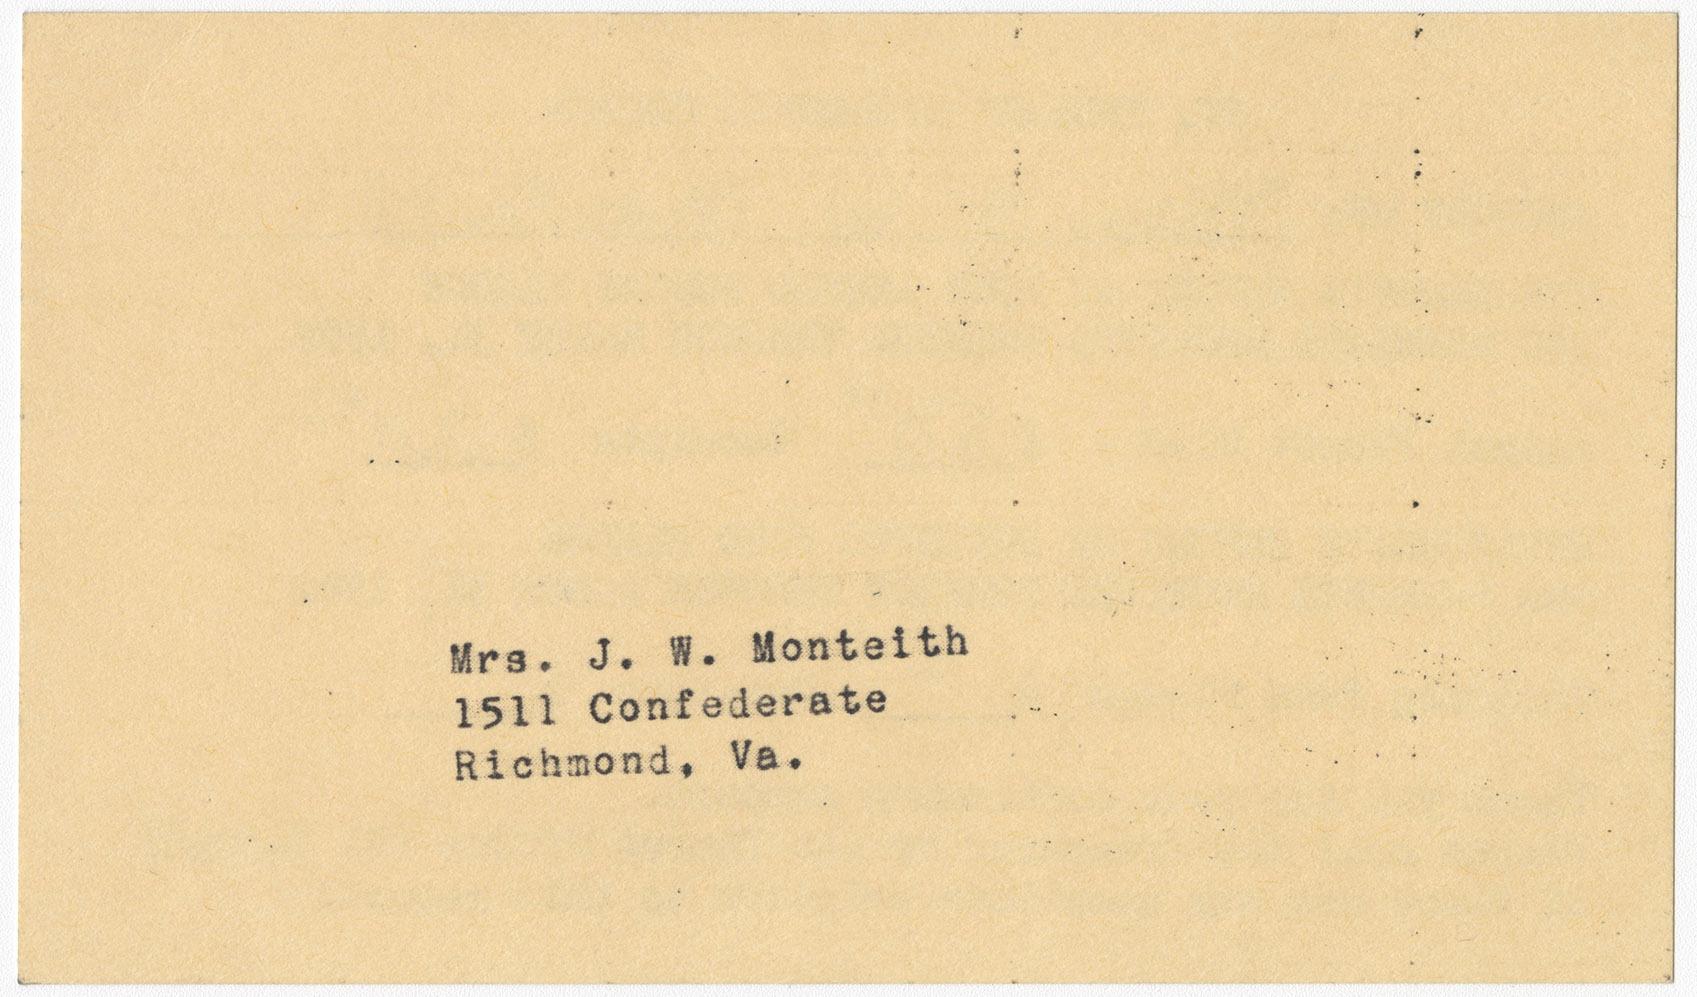 Ms1990_062_F27_1962_0331a.jpg